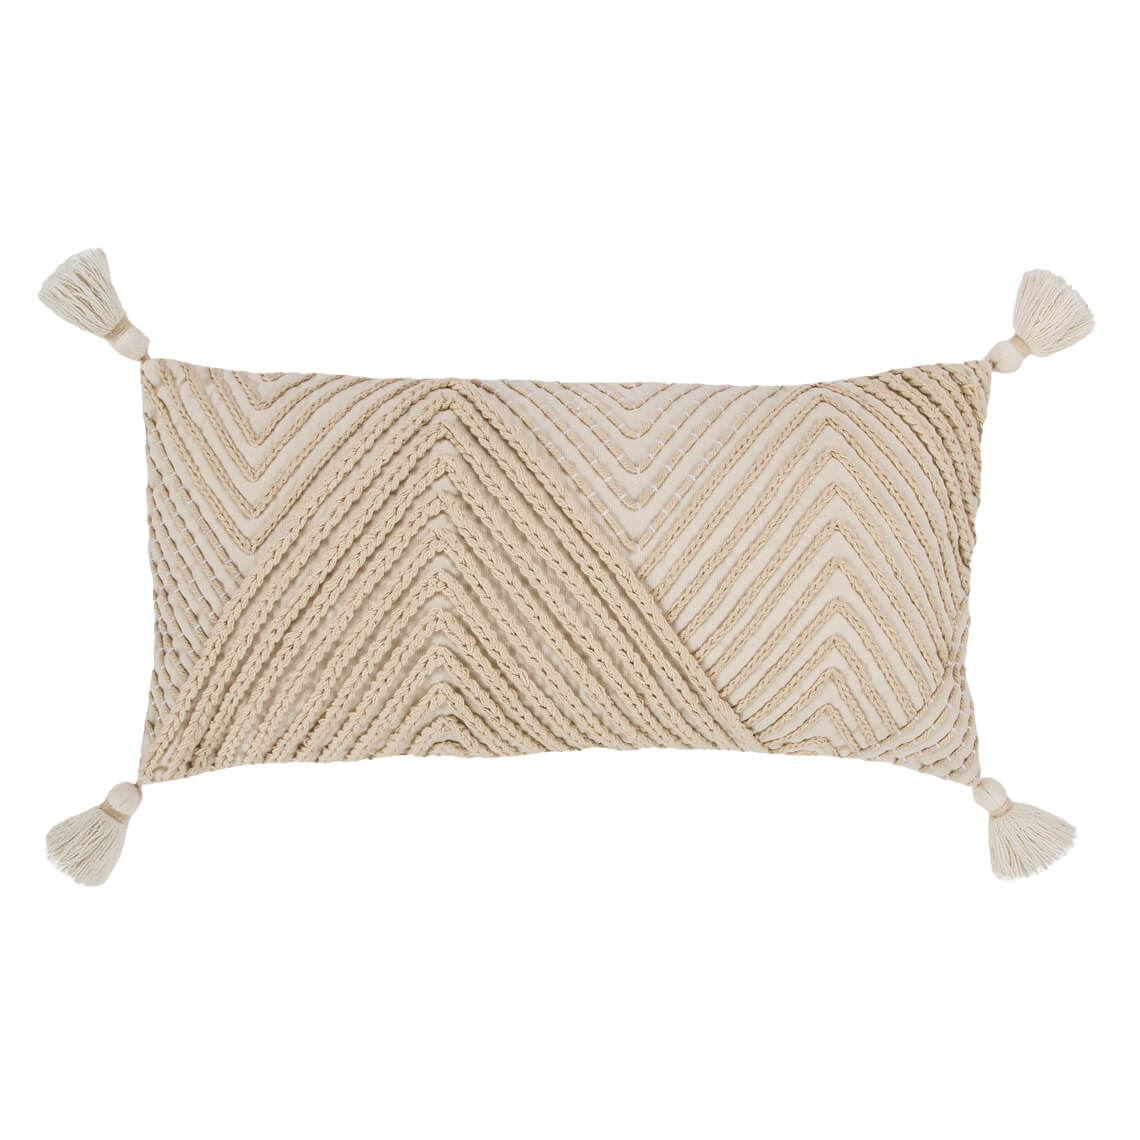 Rekki Cushion Size W 35cm x D 70cm x H 8cm in Natural Freedom